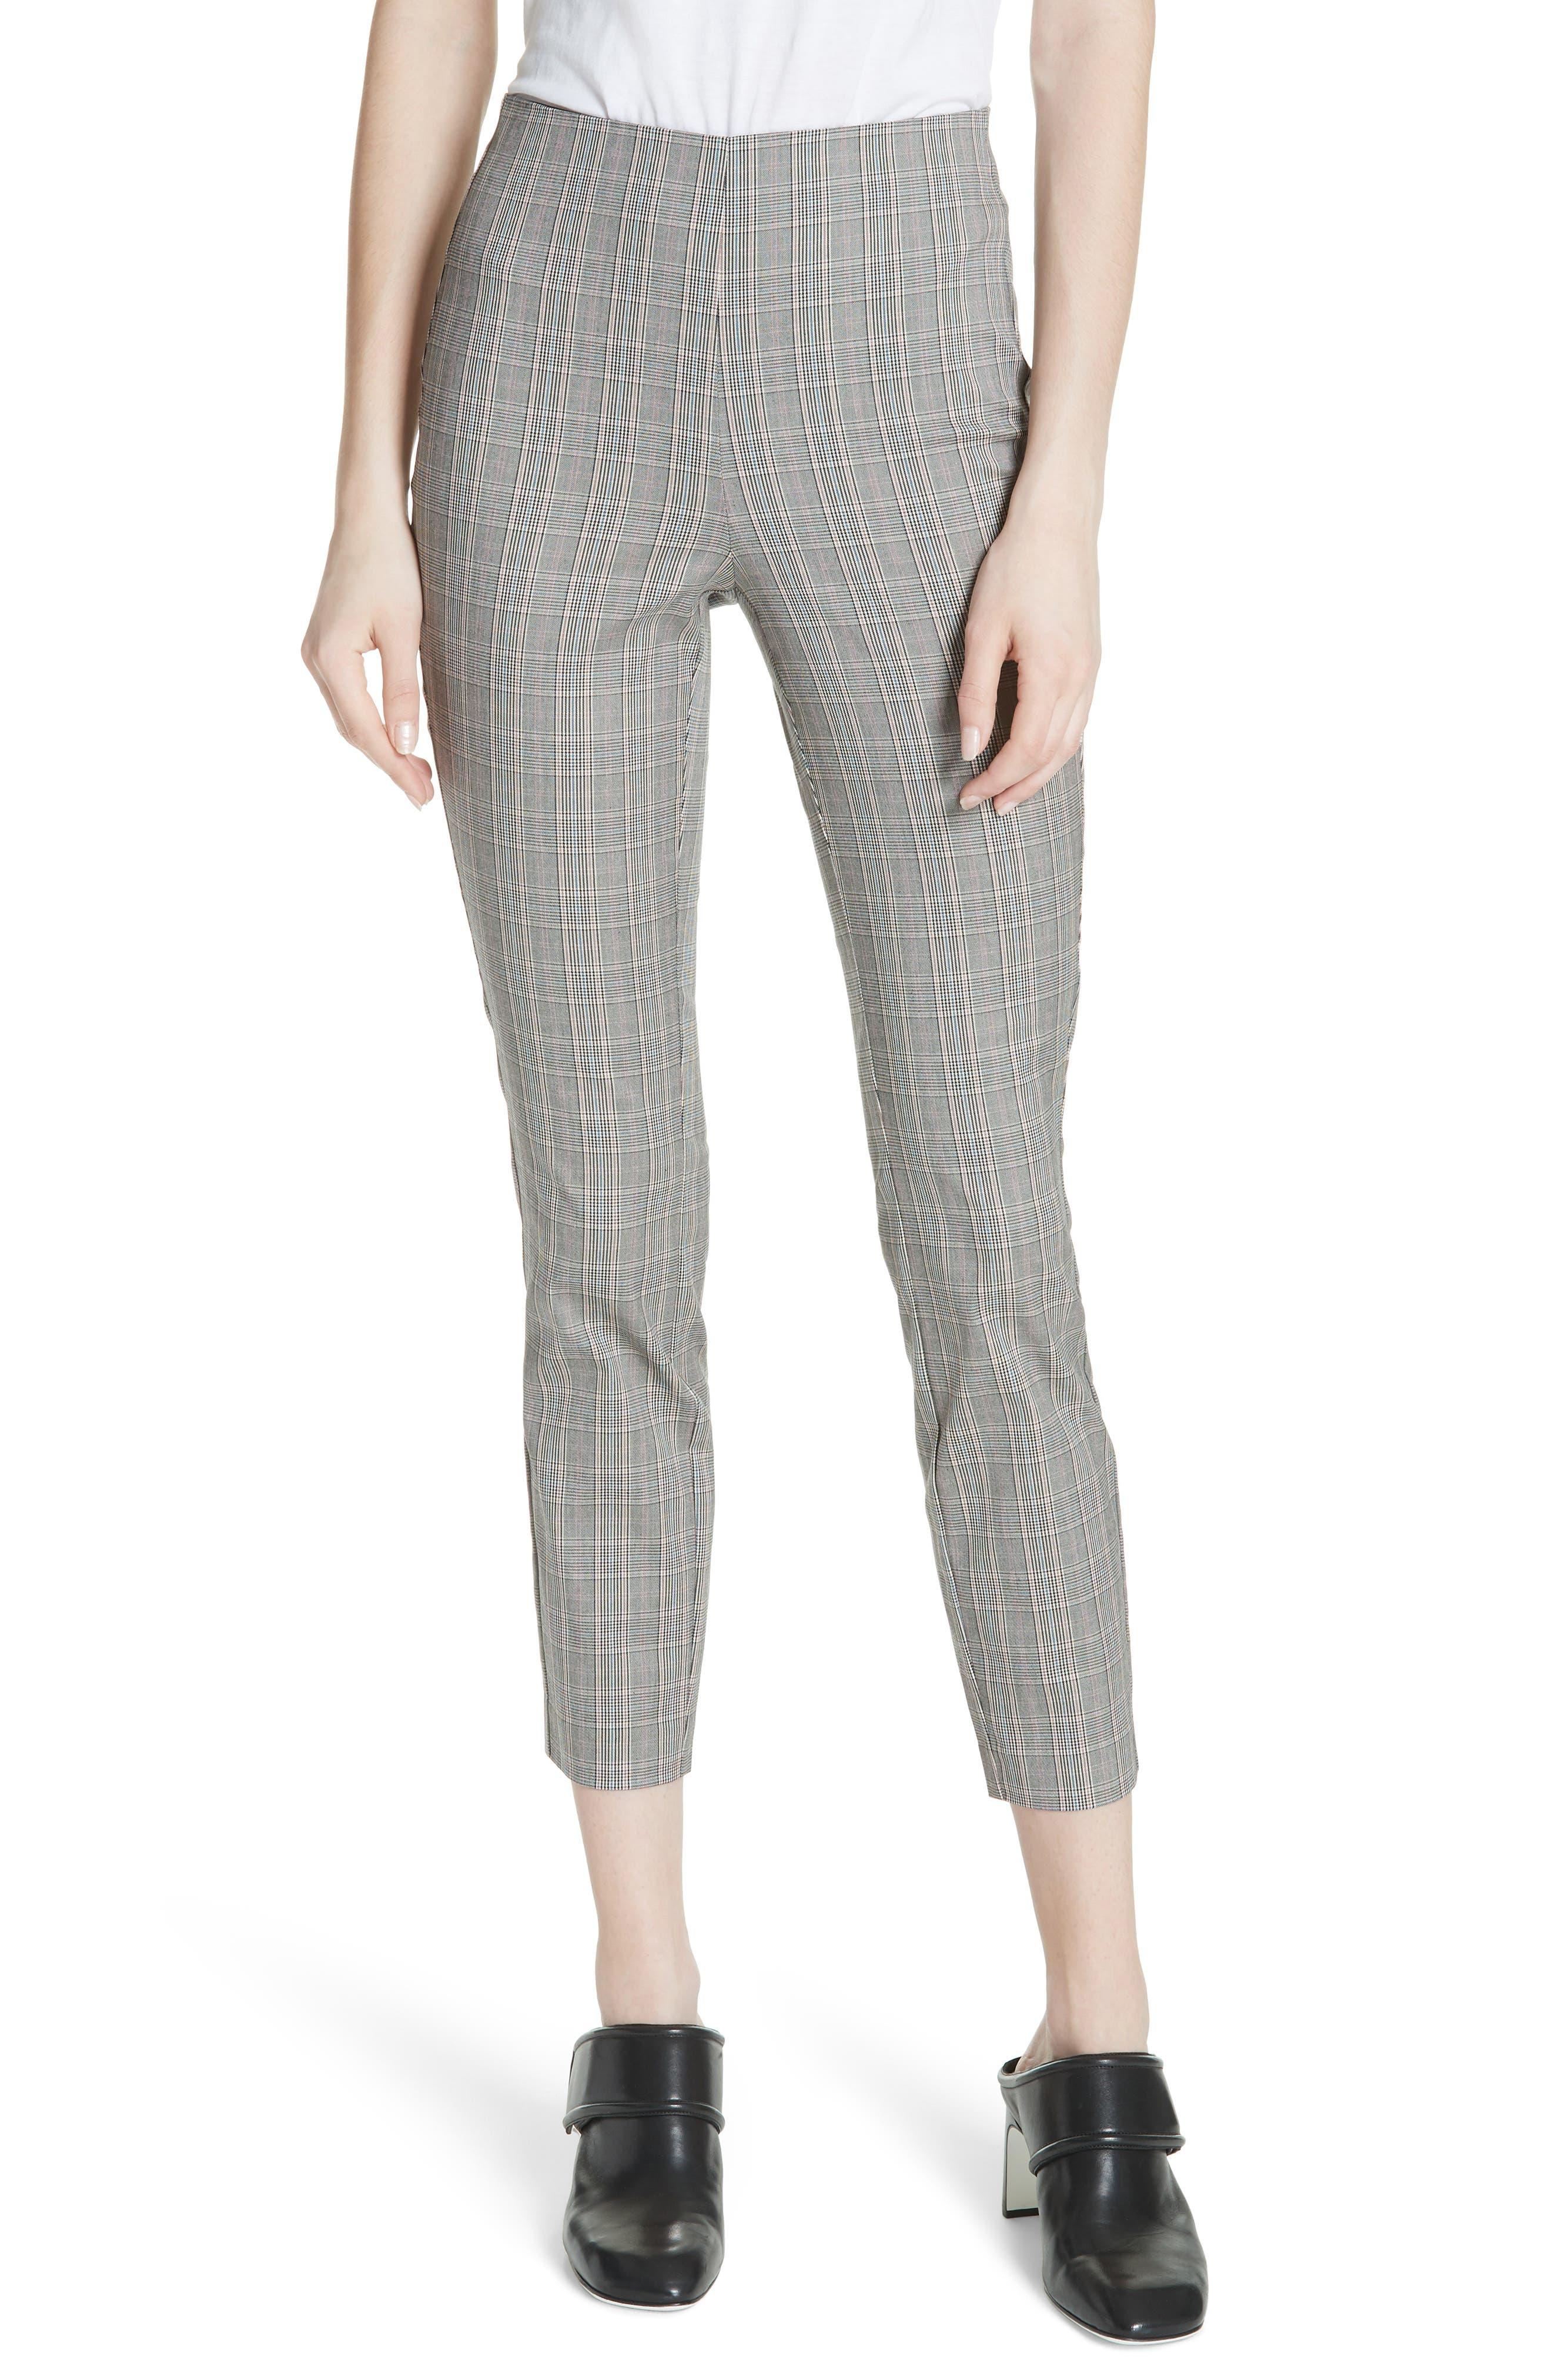 RAG & BONE Simone Glen Plaid Pants, Main, color, 017